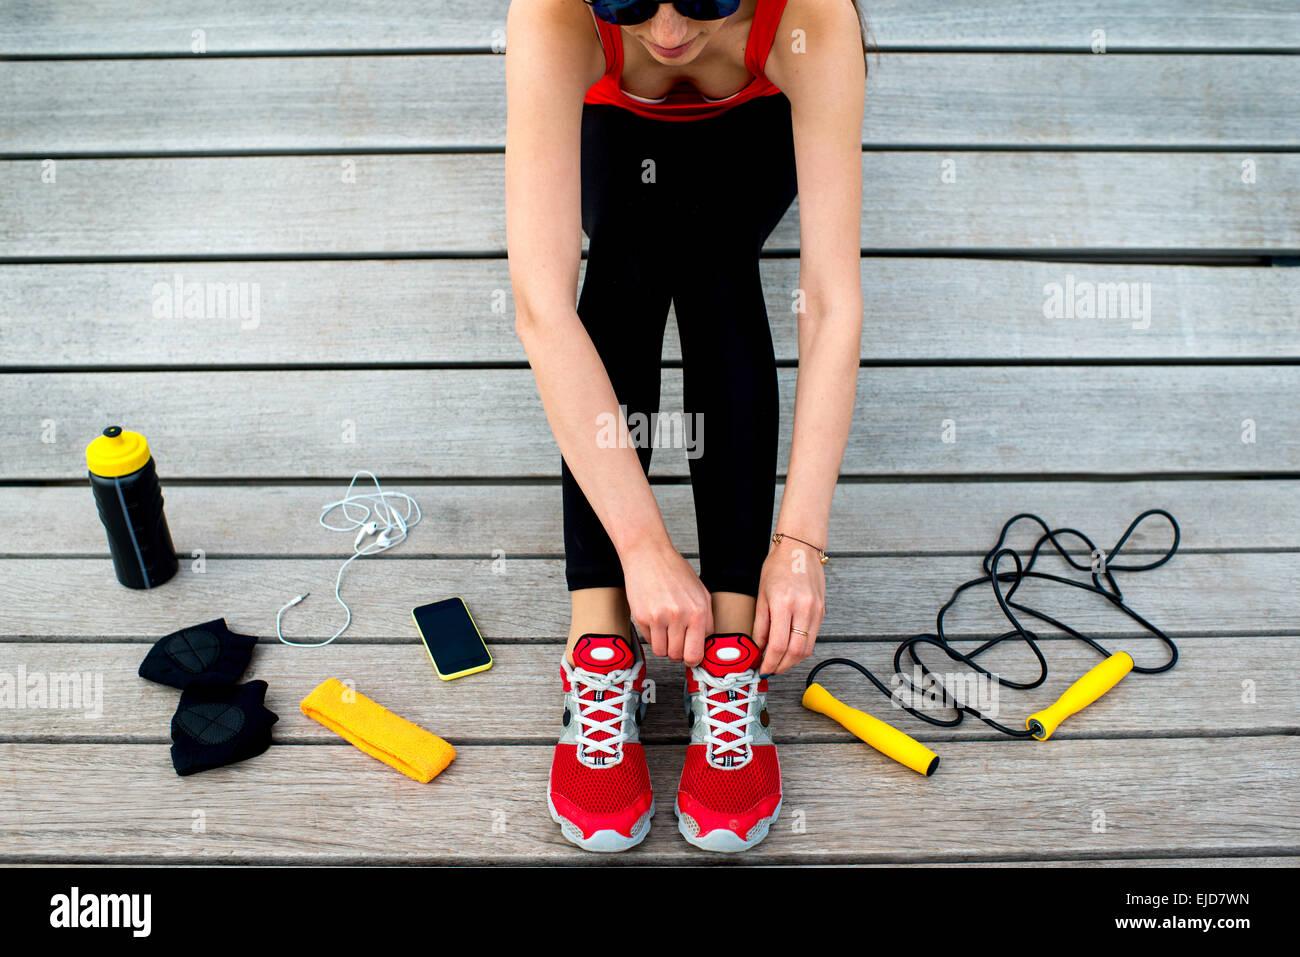 Sport-Frau auf der Sonnenbank Stockbild